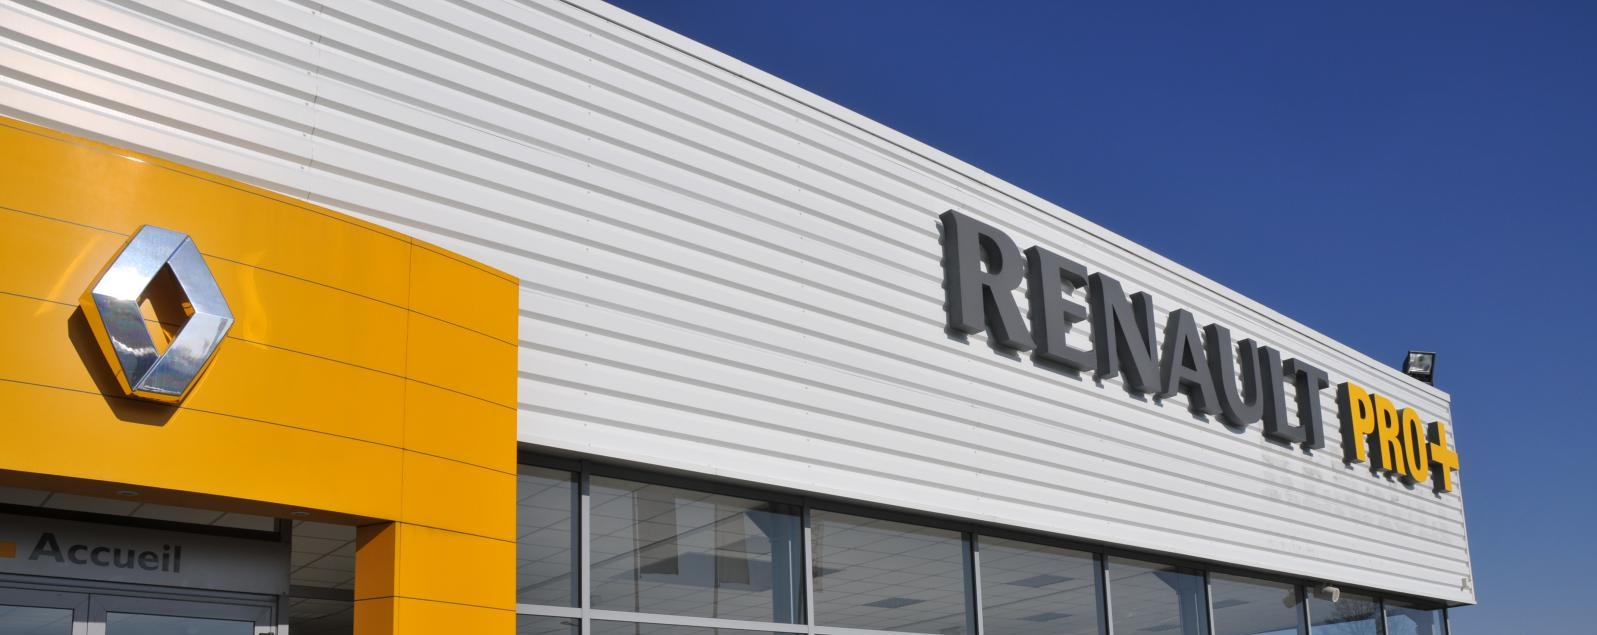 Chatbot Renault